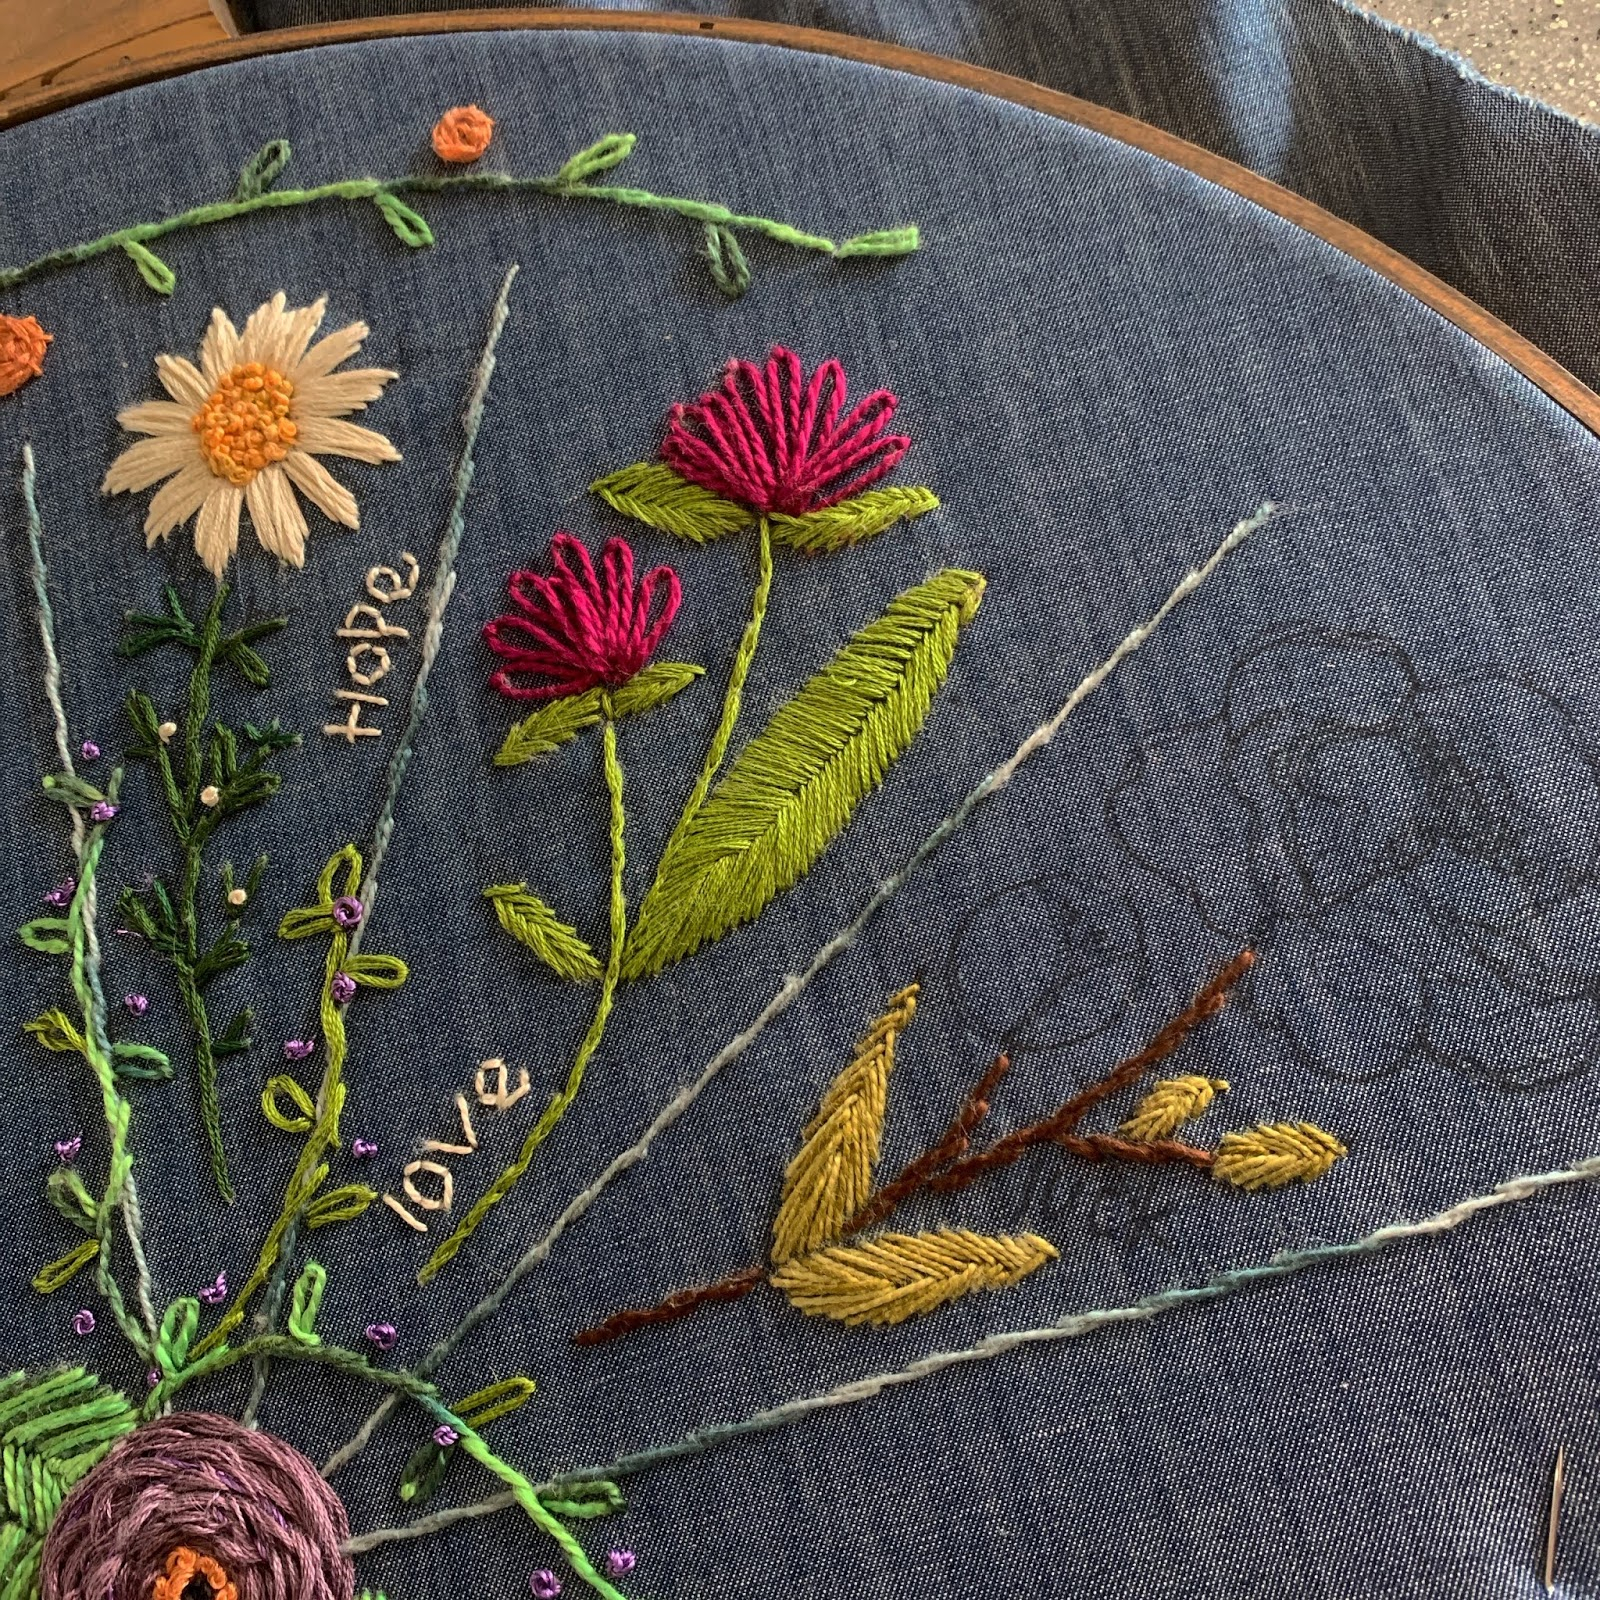 Free Flower Embroidery Patterns Flourishing Floral Embroidery Jan Feb Tweetle Dee Design Co